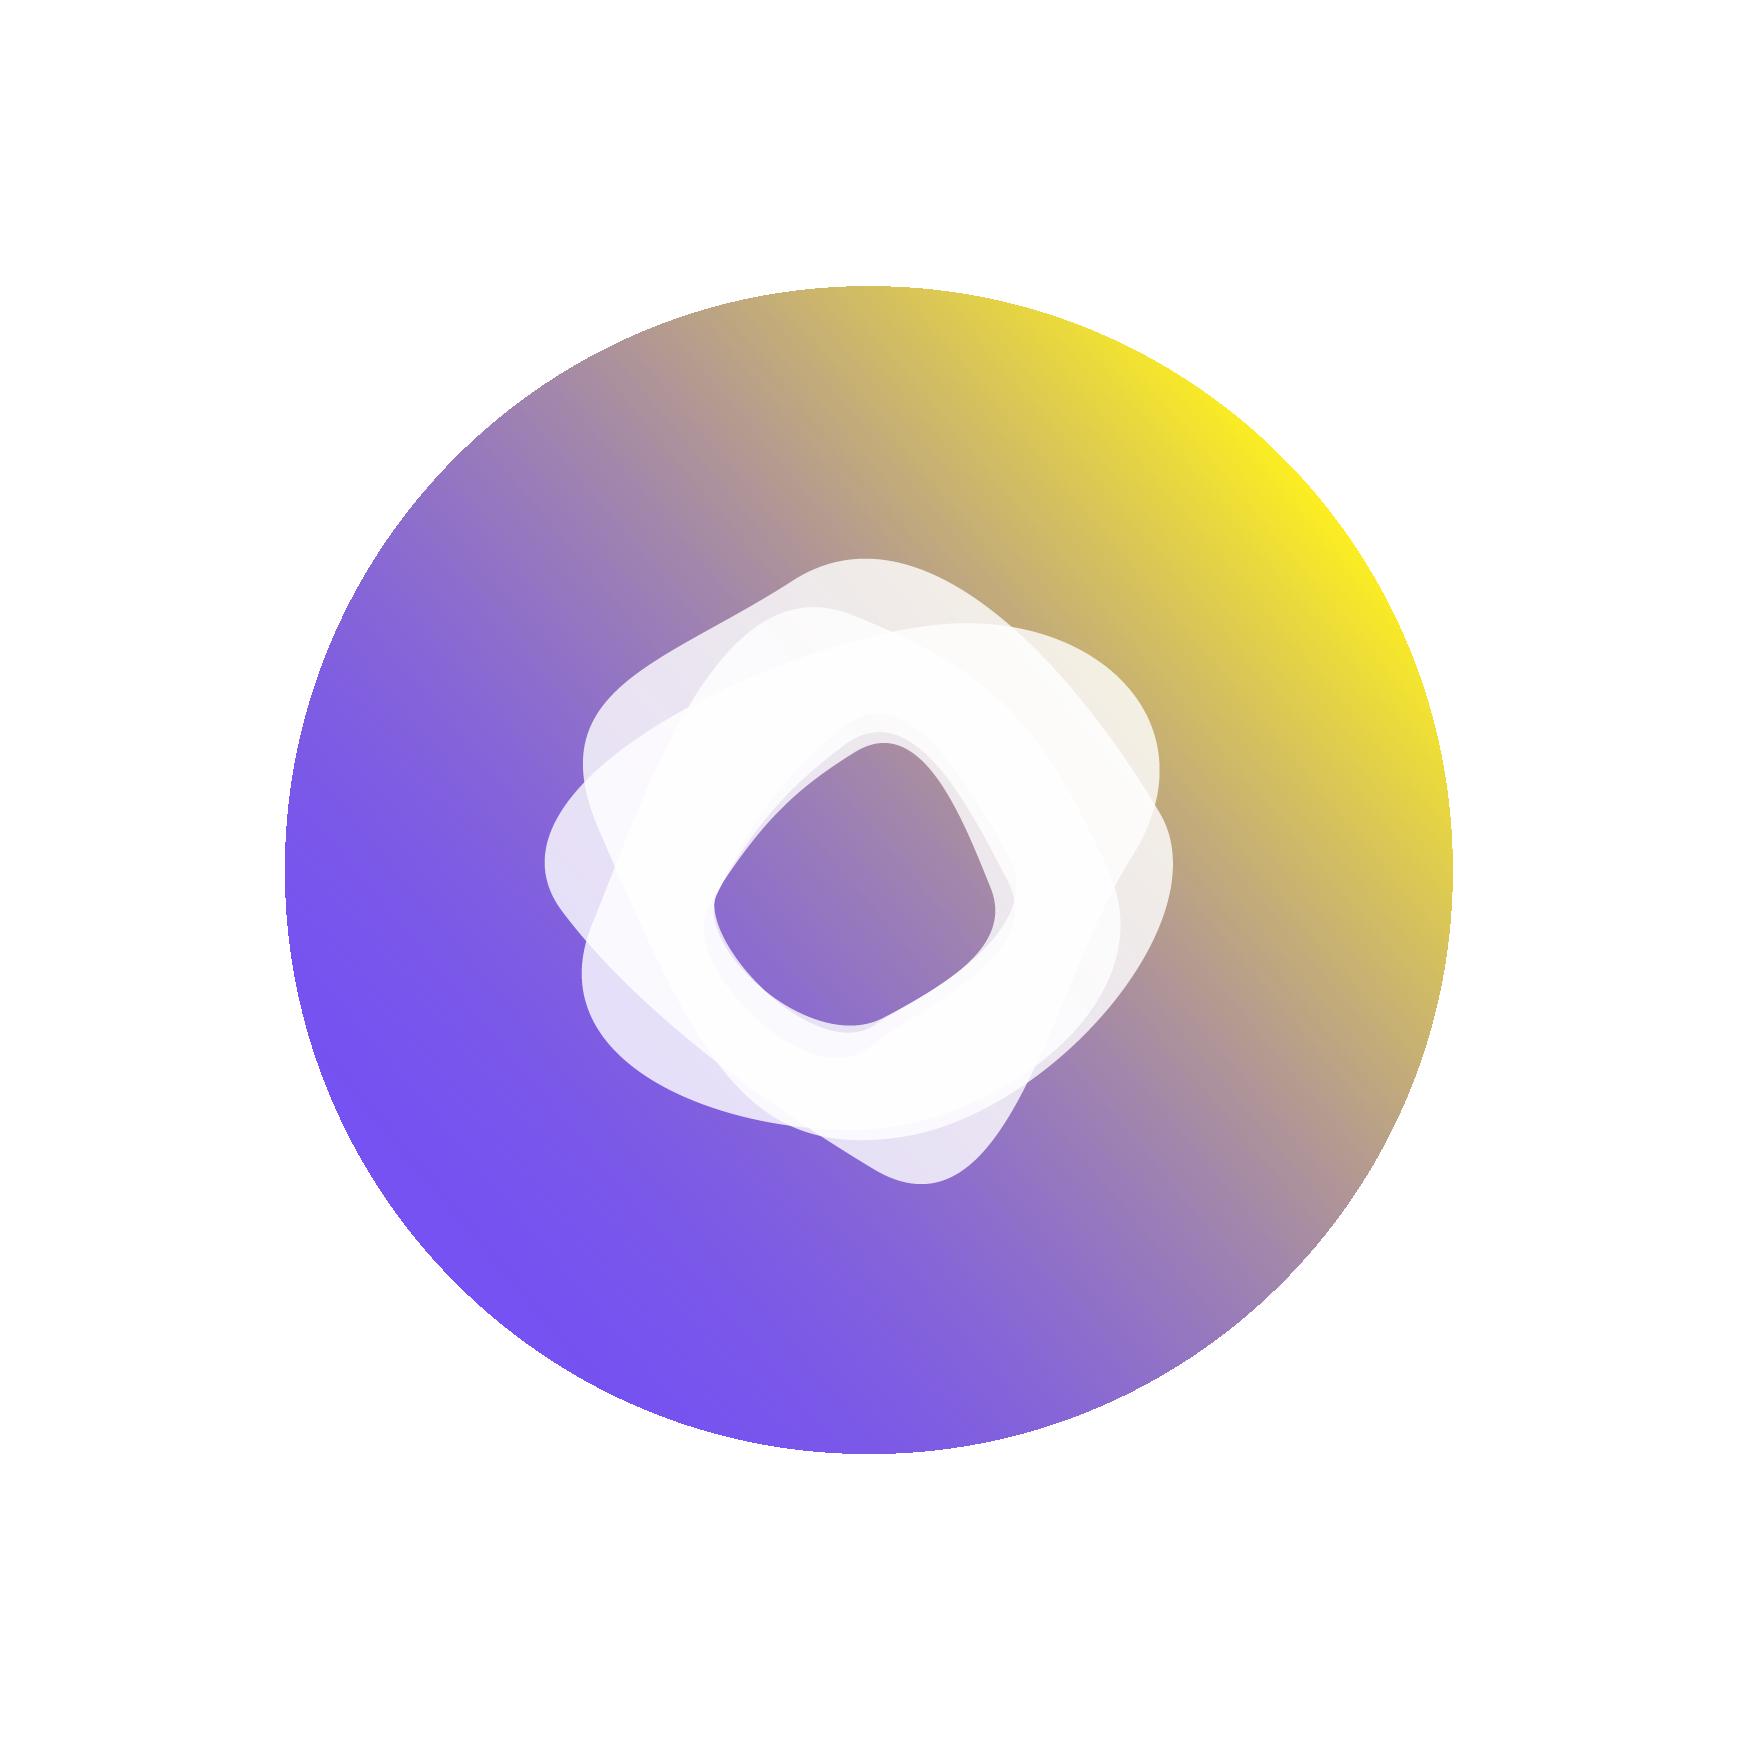 Subcapitals_Logo